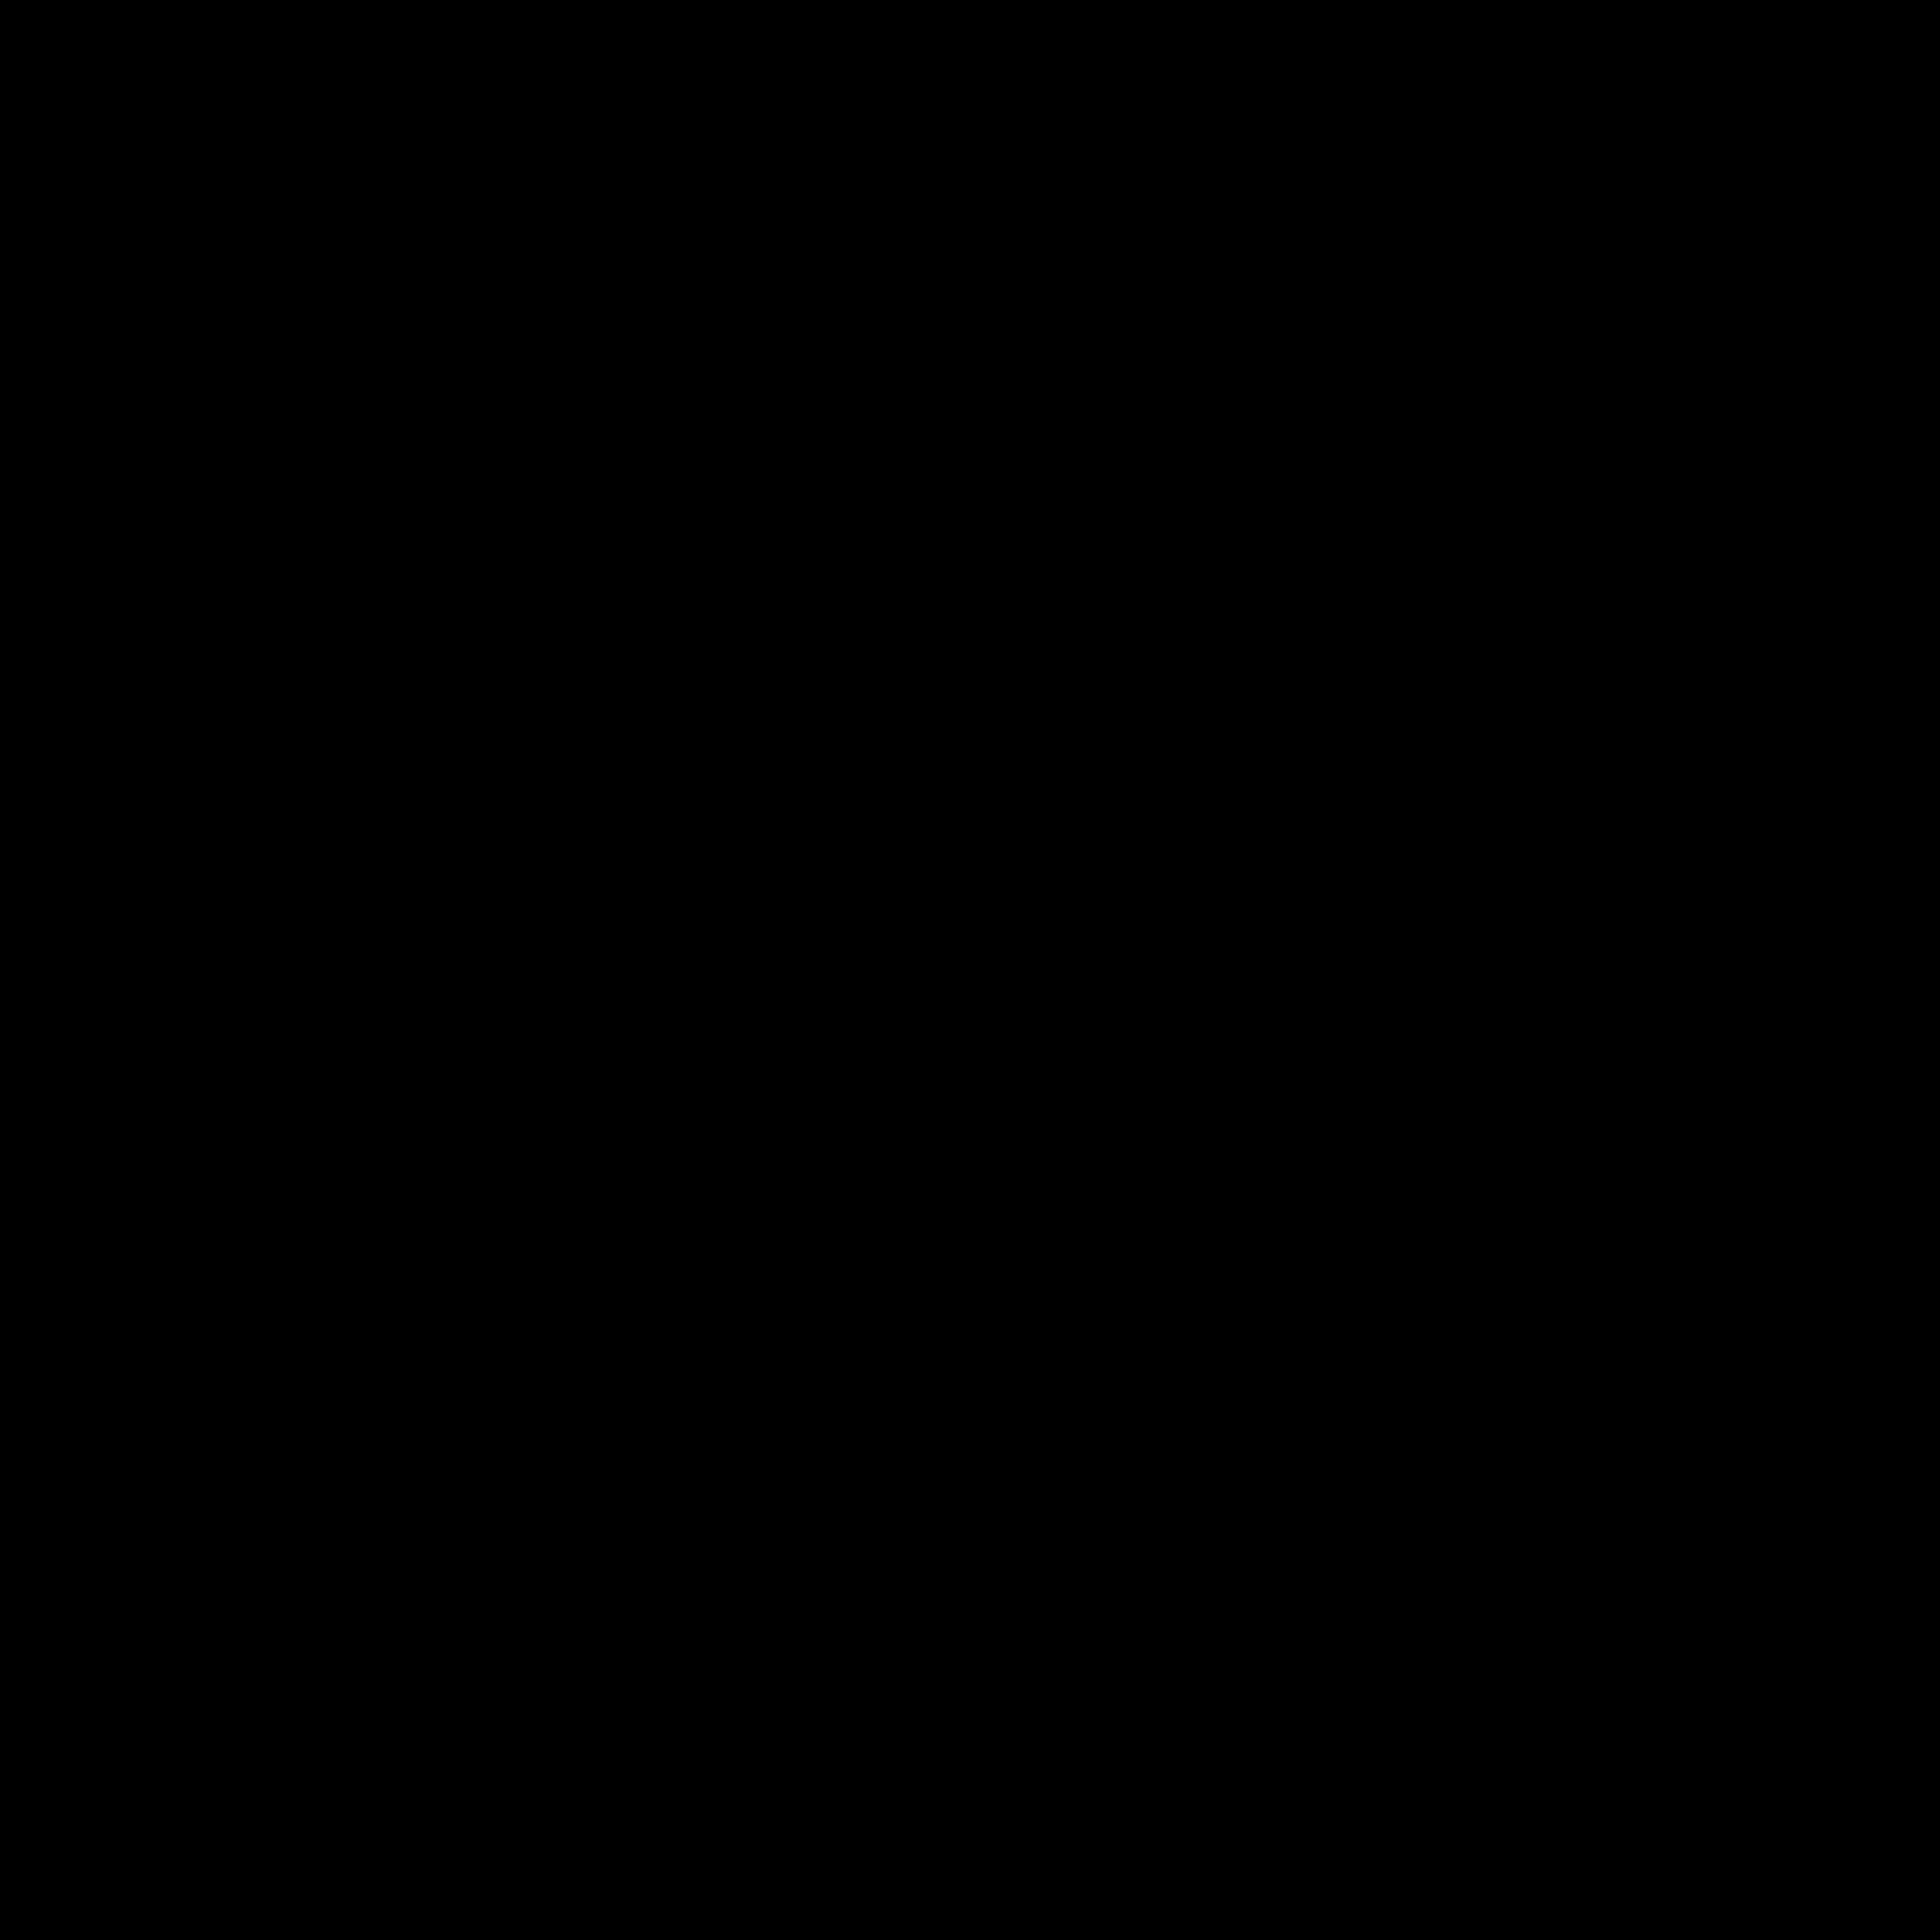 midland-3-logo-png-transparent